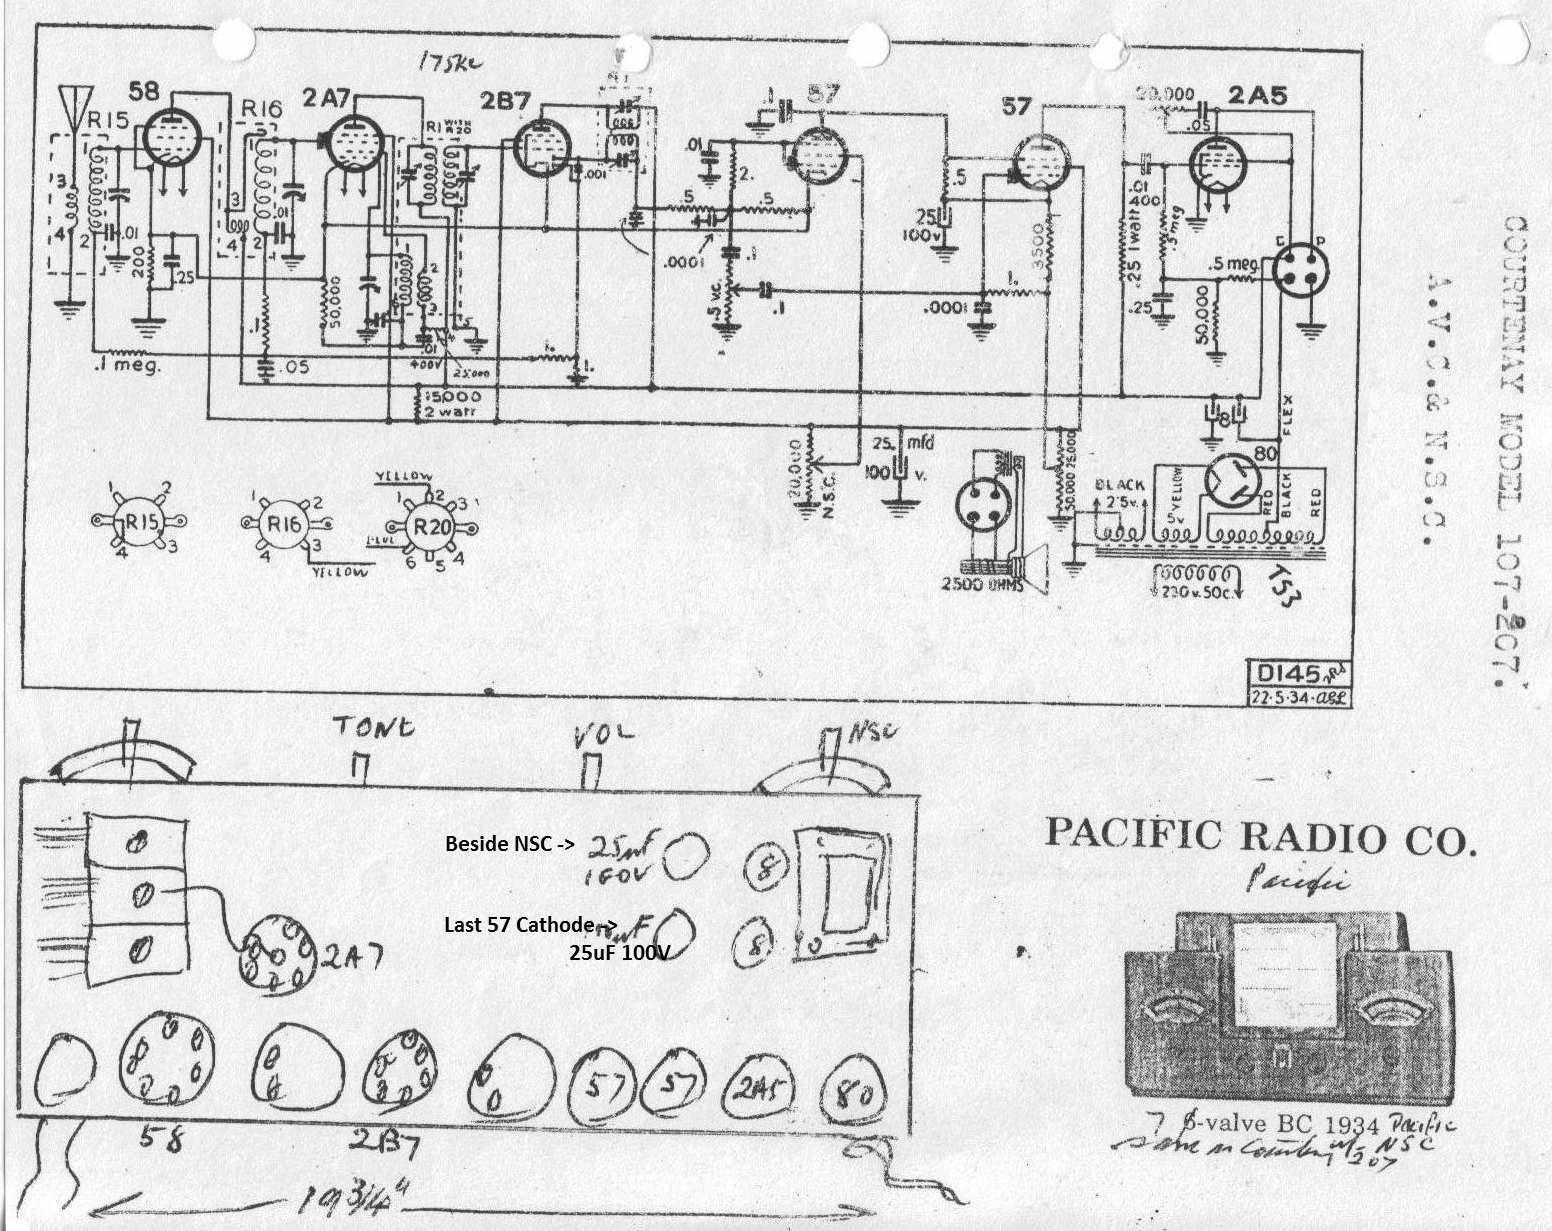 The Nz Vintage Radio Project